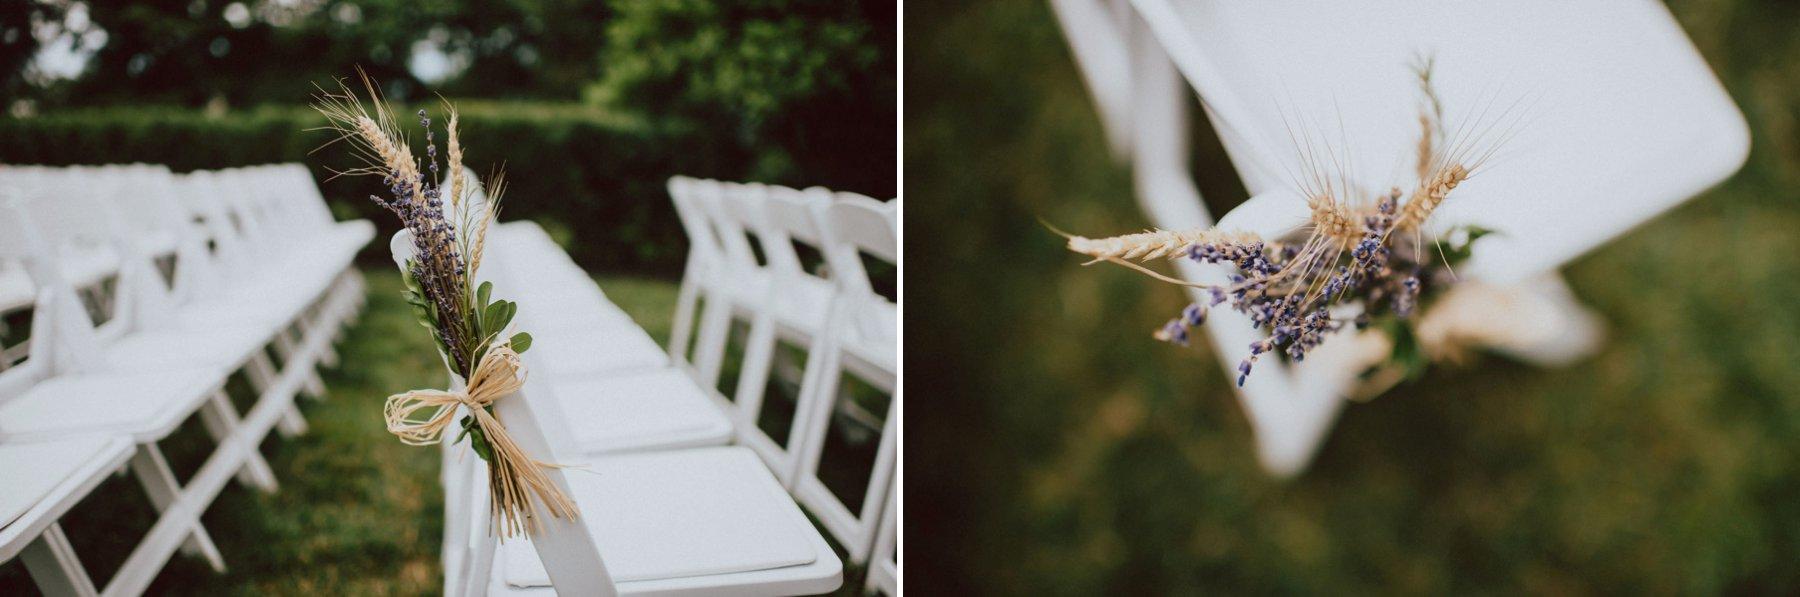 Knowlton-mansion-wedding-83.jpg